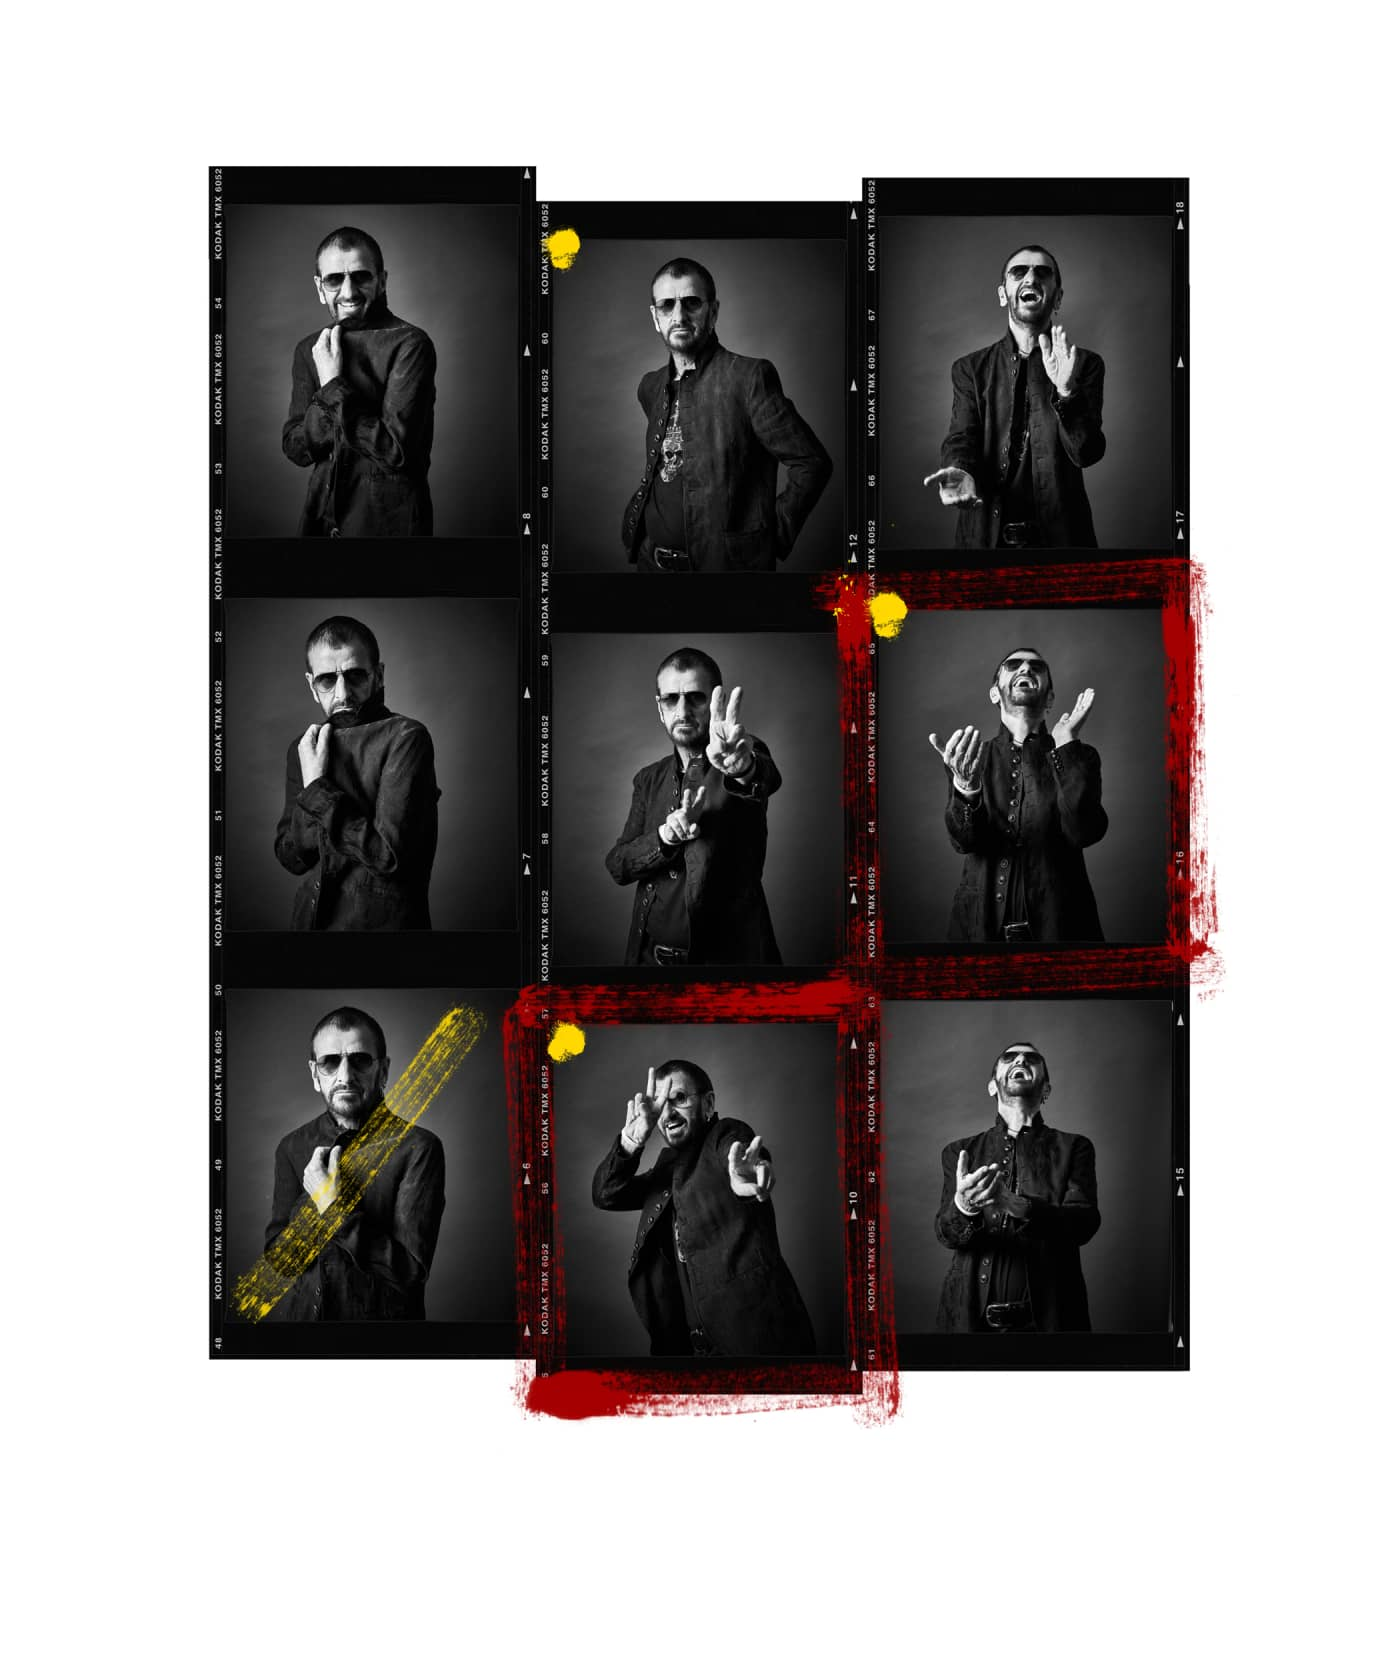 Andy Gotts Ringo Starr Contact Sheet Fine Art Giclée Archival Print